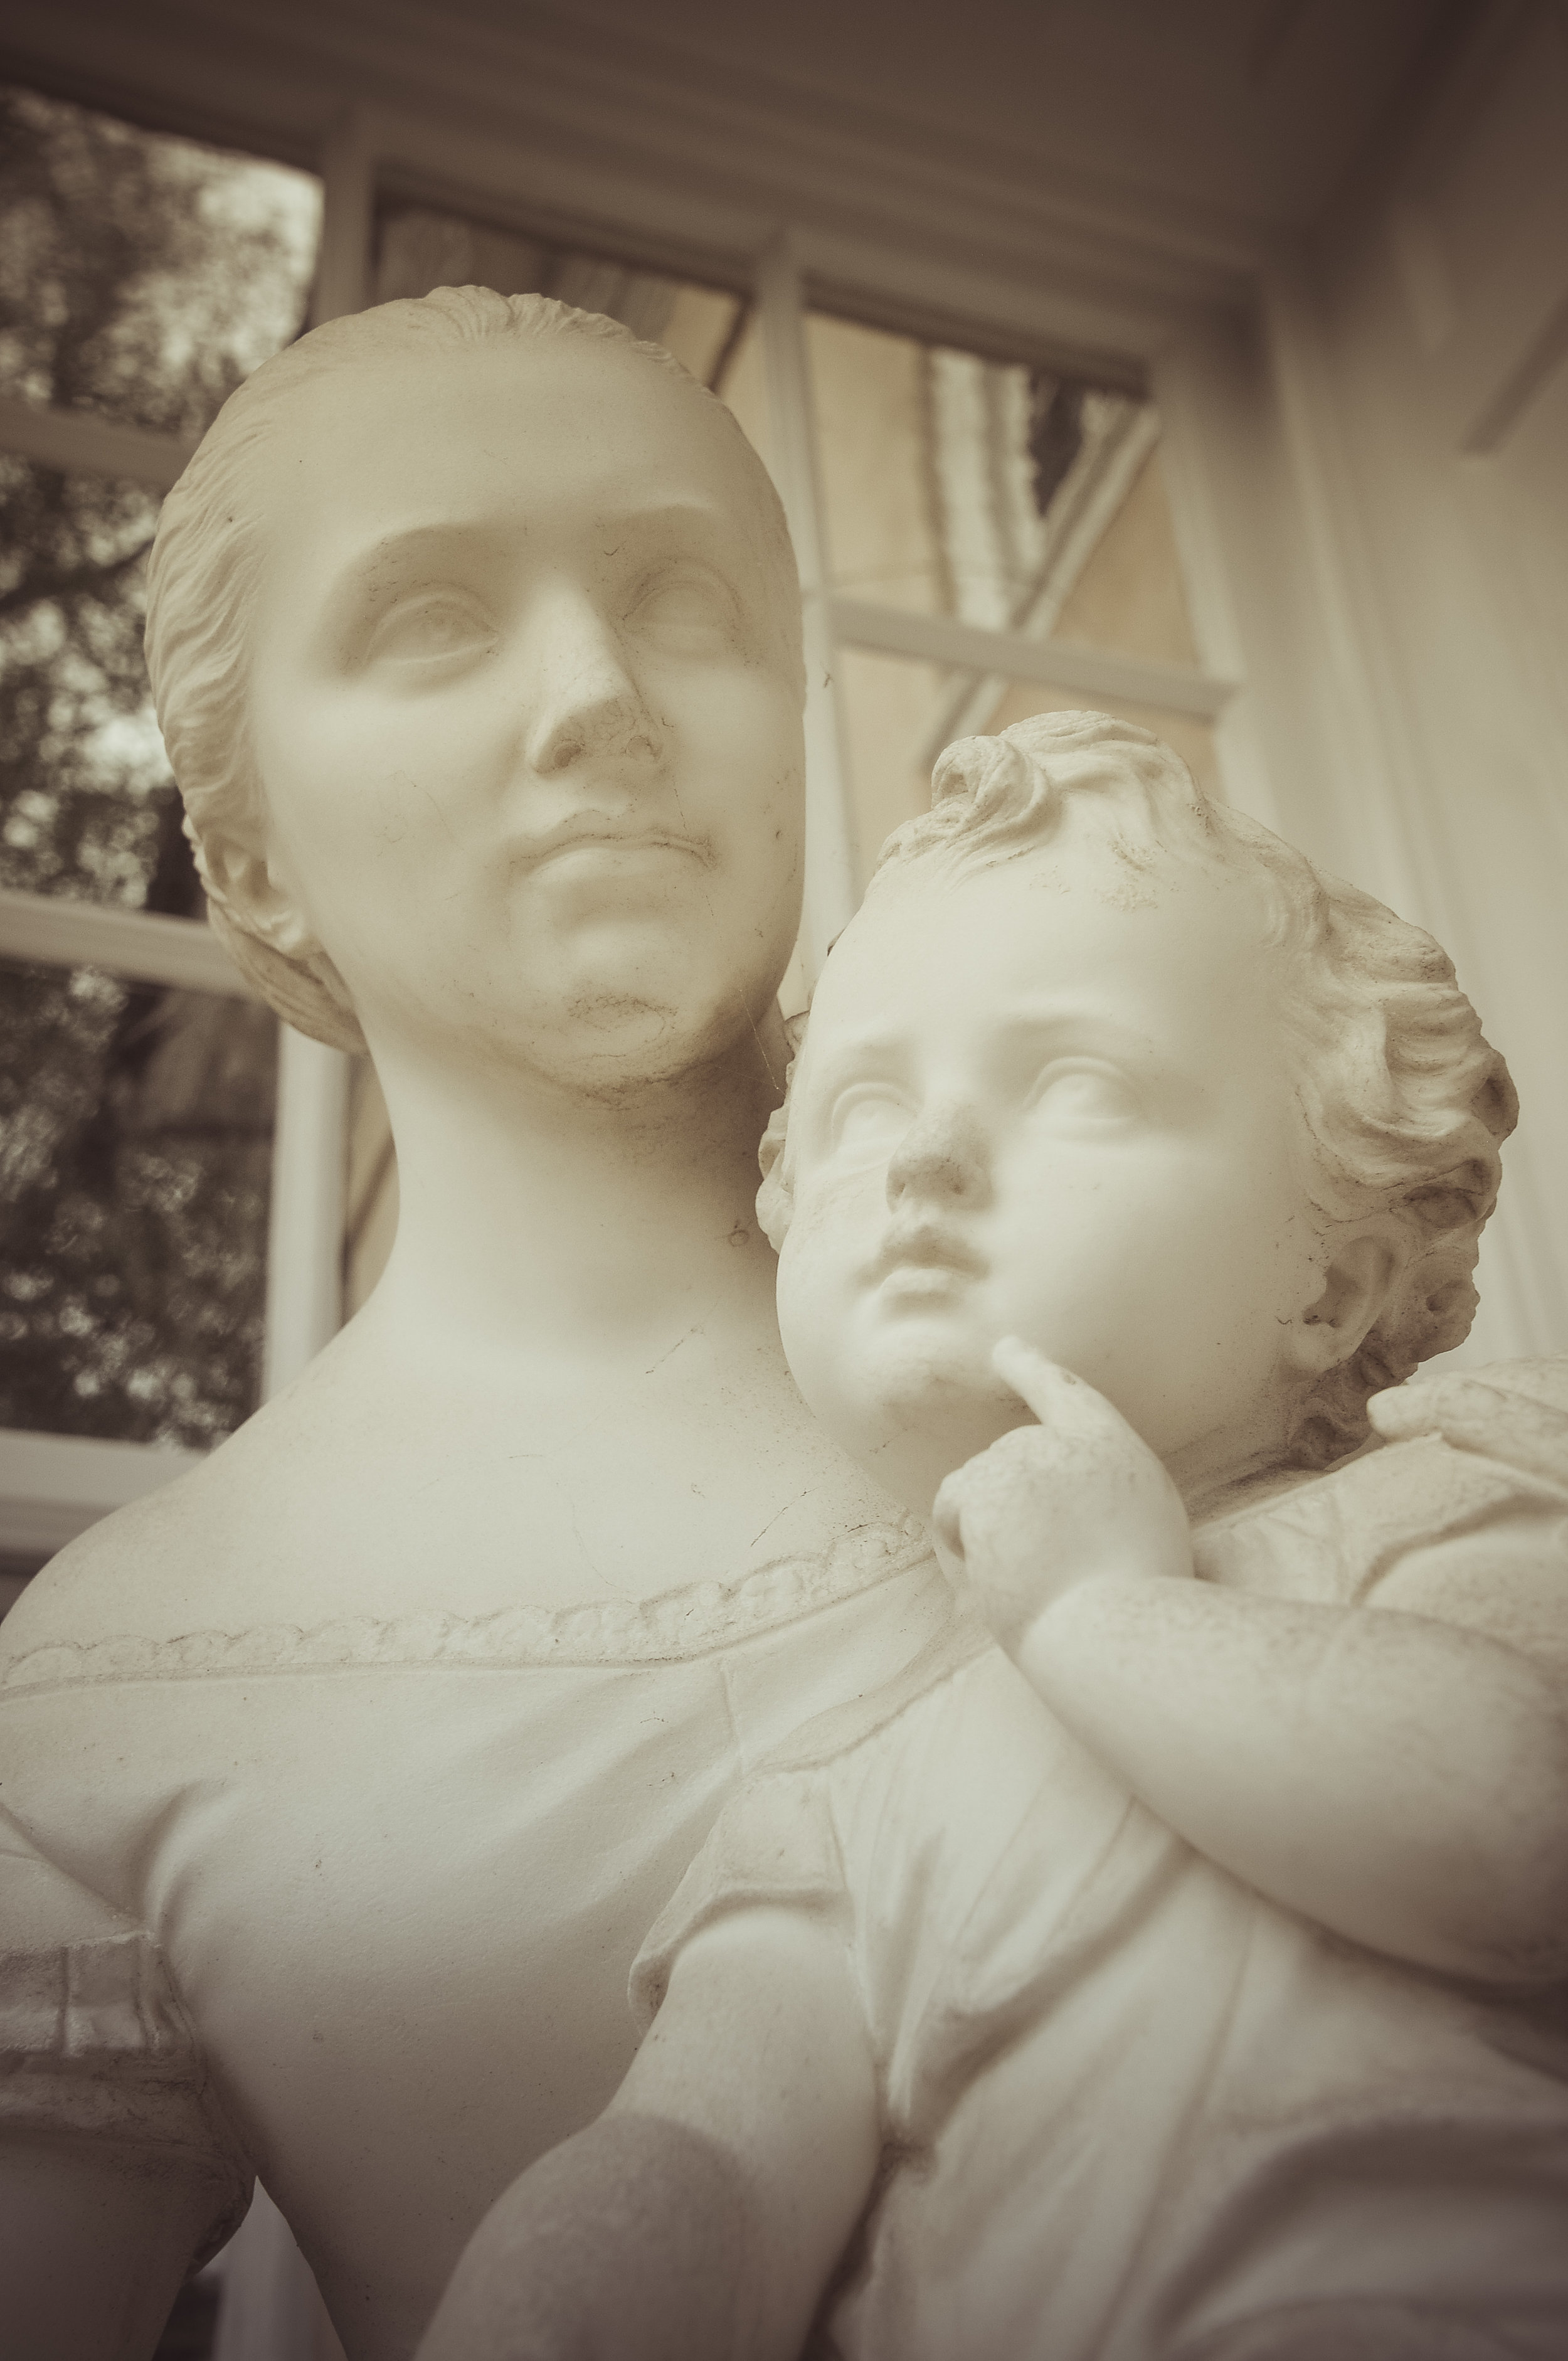 White Madonna (Statue at Hampton Plantation) Photo: Rose Anderson, 2018